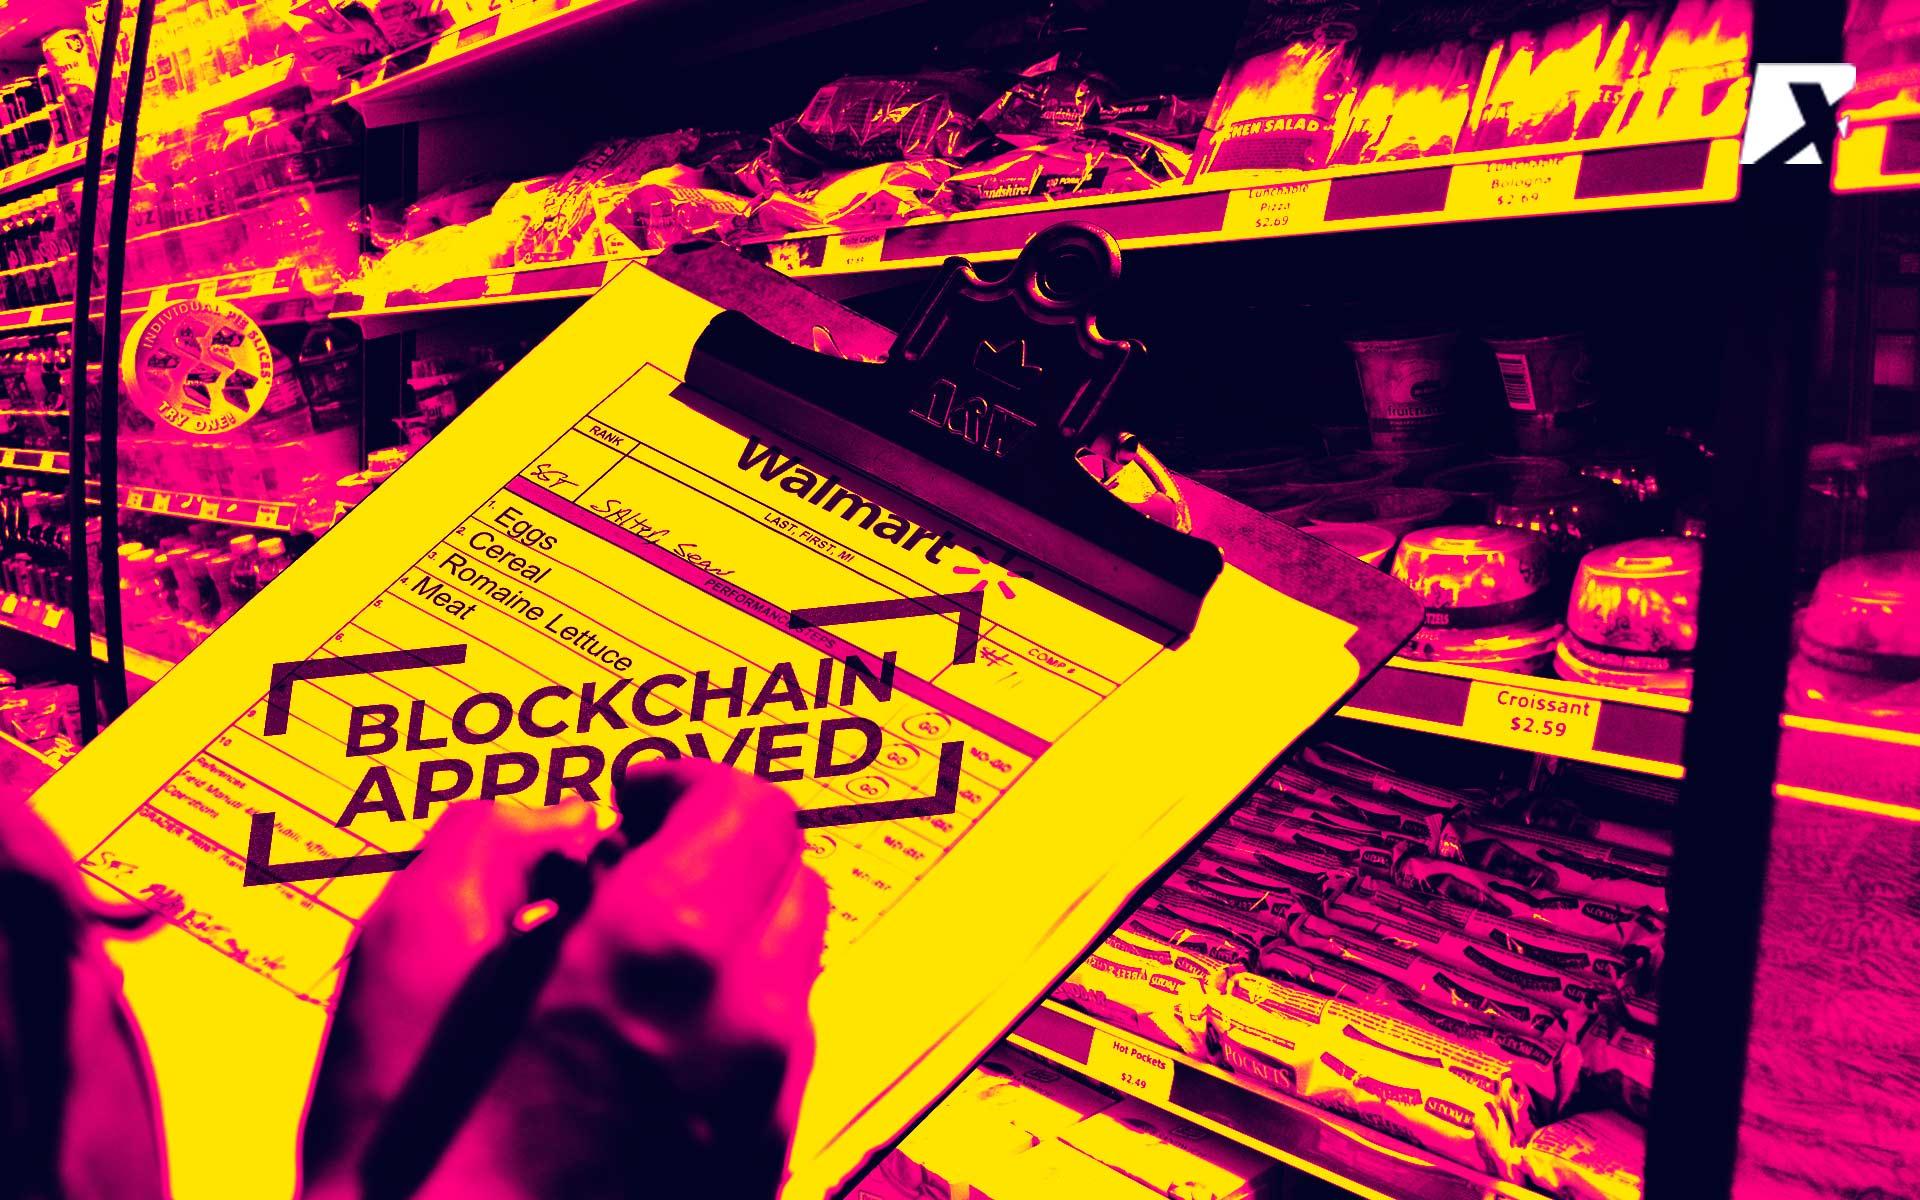 In Wake Of E. coli Walmart Asks Leafy Green Suppliers To Use Blockchain